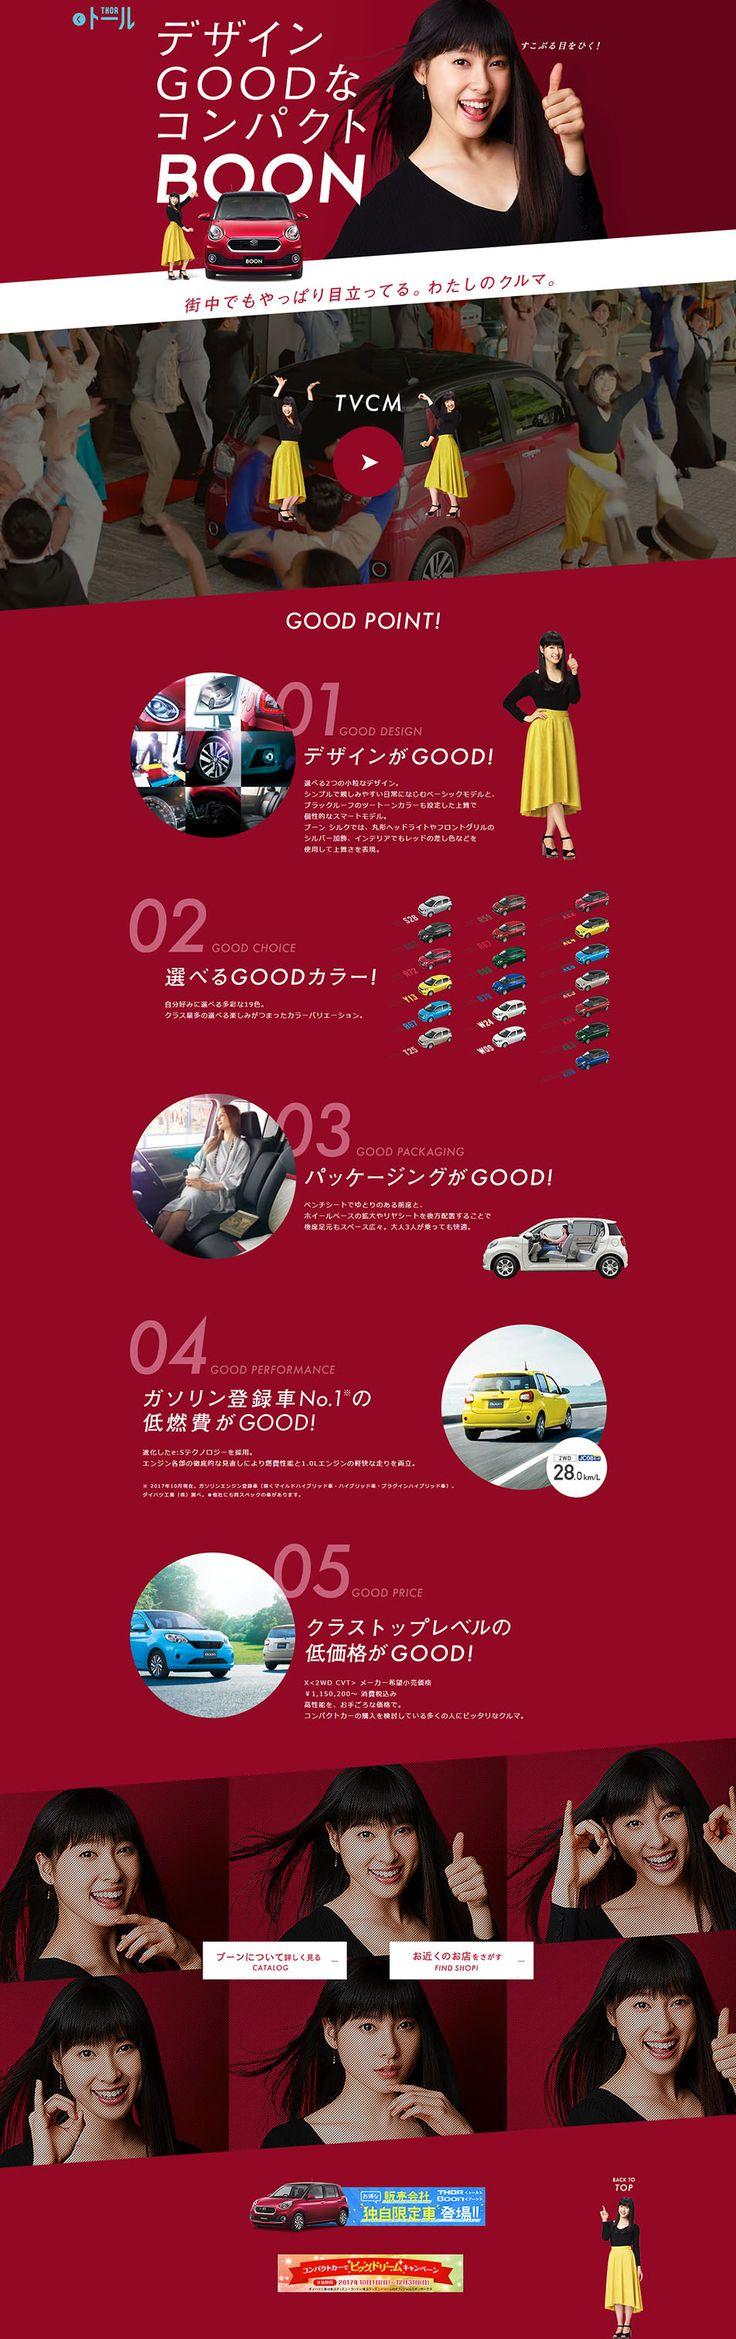 DAIHATSU様の「BOON」のランディングページ(LP)かっこいい系|車・バイク・自転車